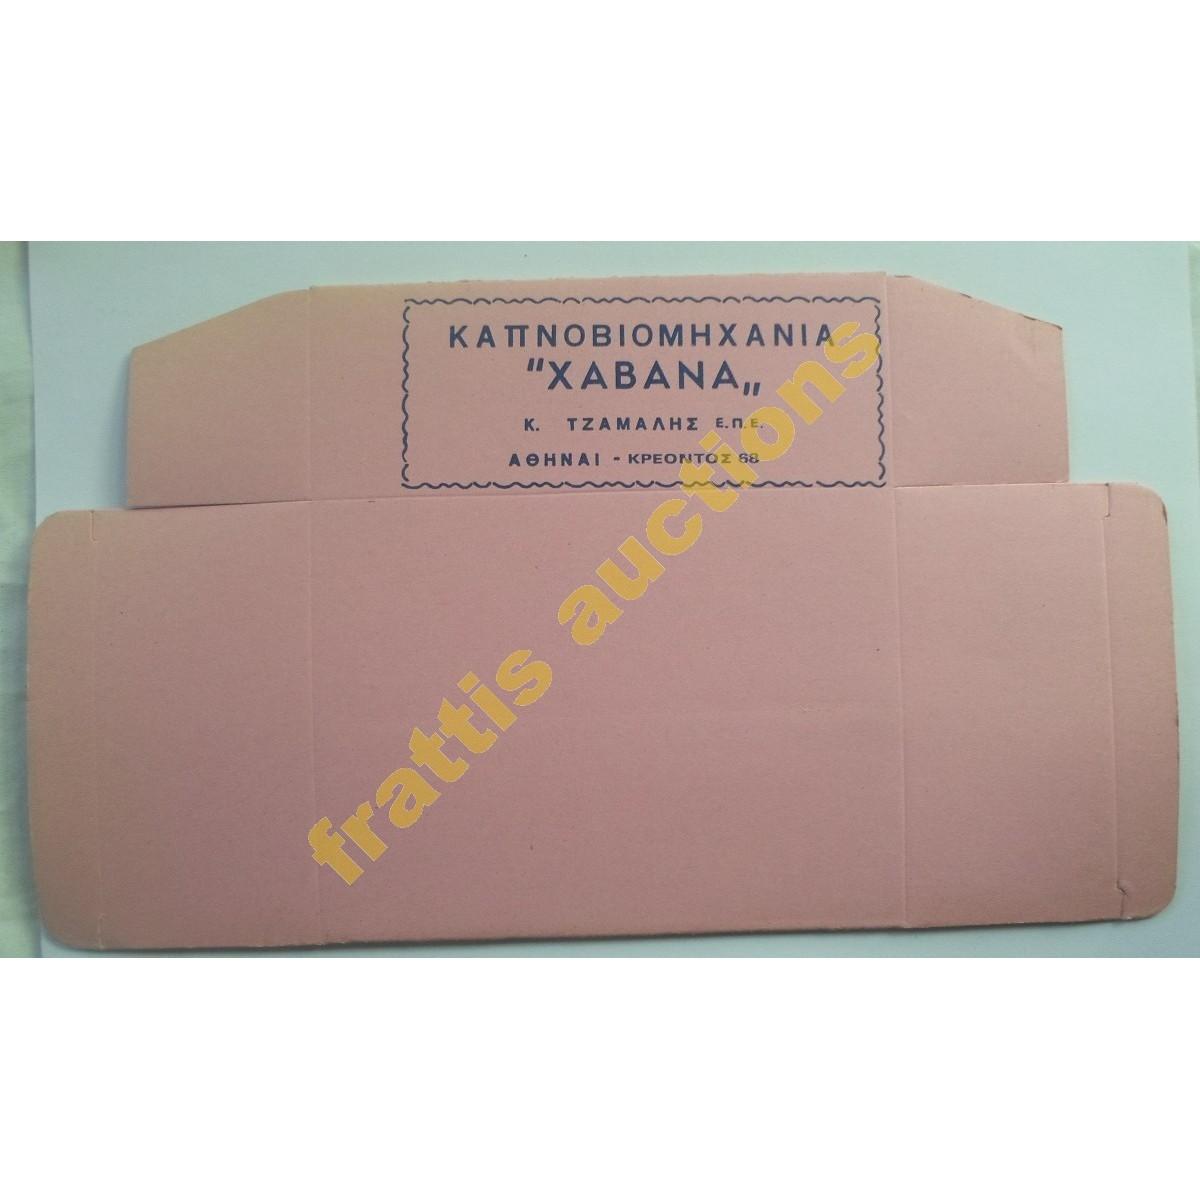 "Vintage  χάρτινη συσκευασία των 250γρ.""ΧΑΒΑΝΑ"" Κ.ΤΖΑΜΑΛΗΣ Ε.Π.Ε.,Greece"